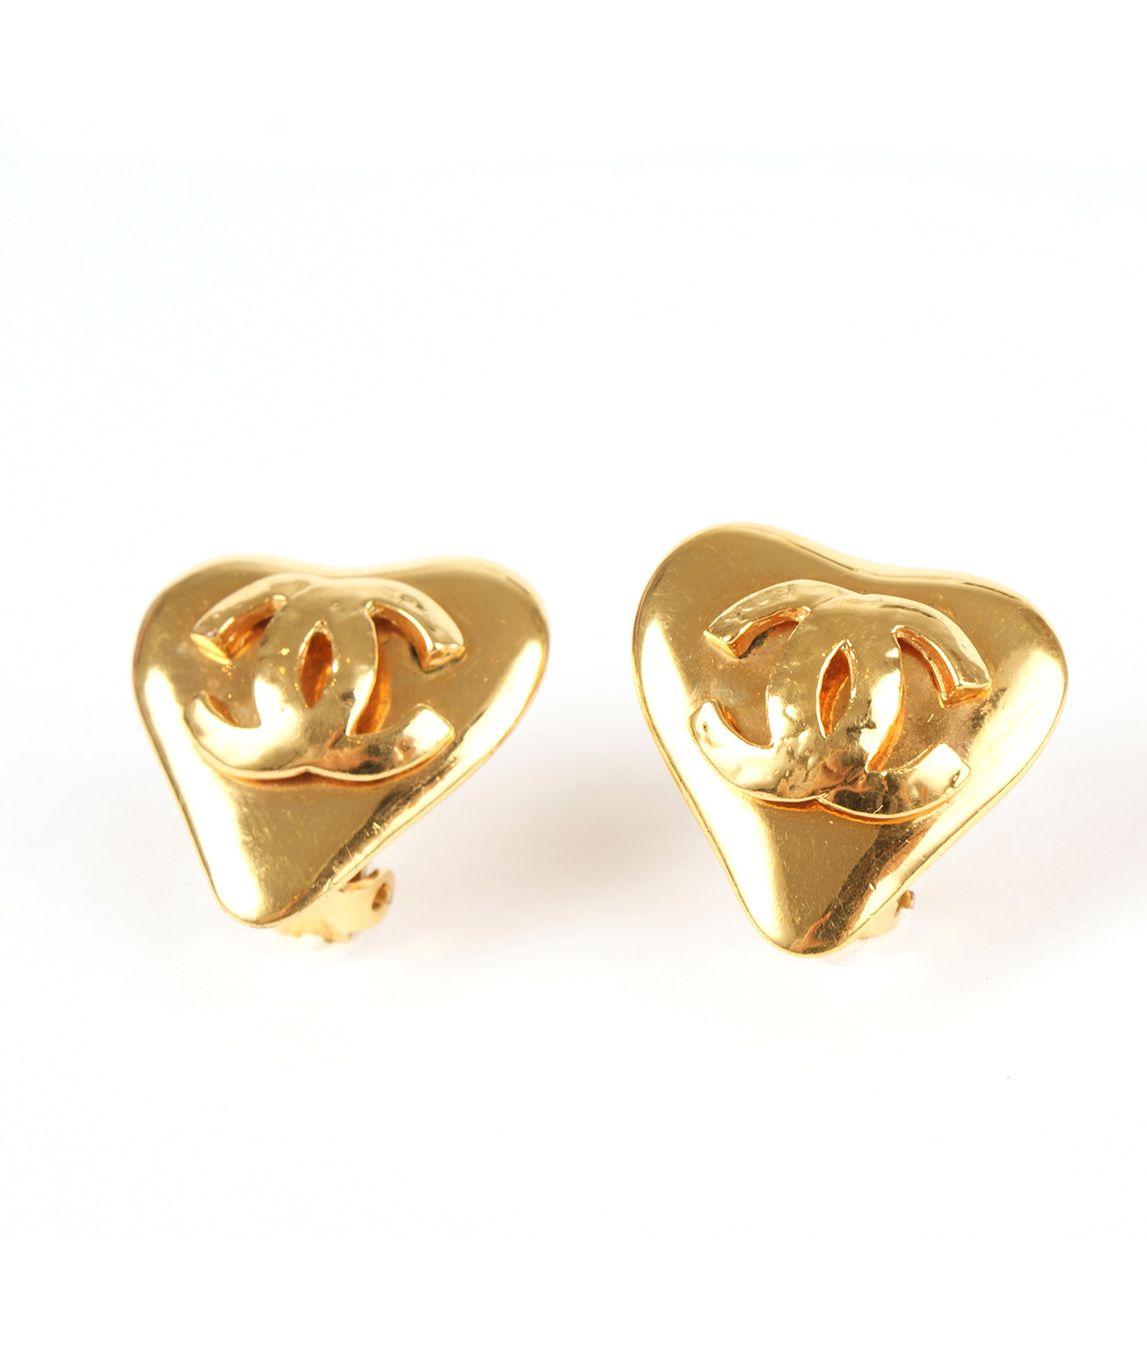 Vintage Chanel heart shaped earrings